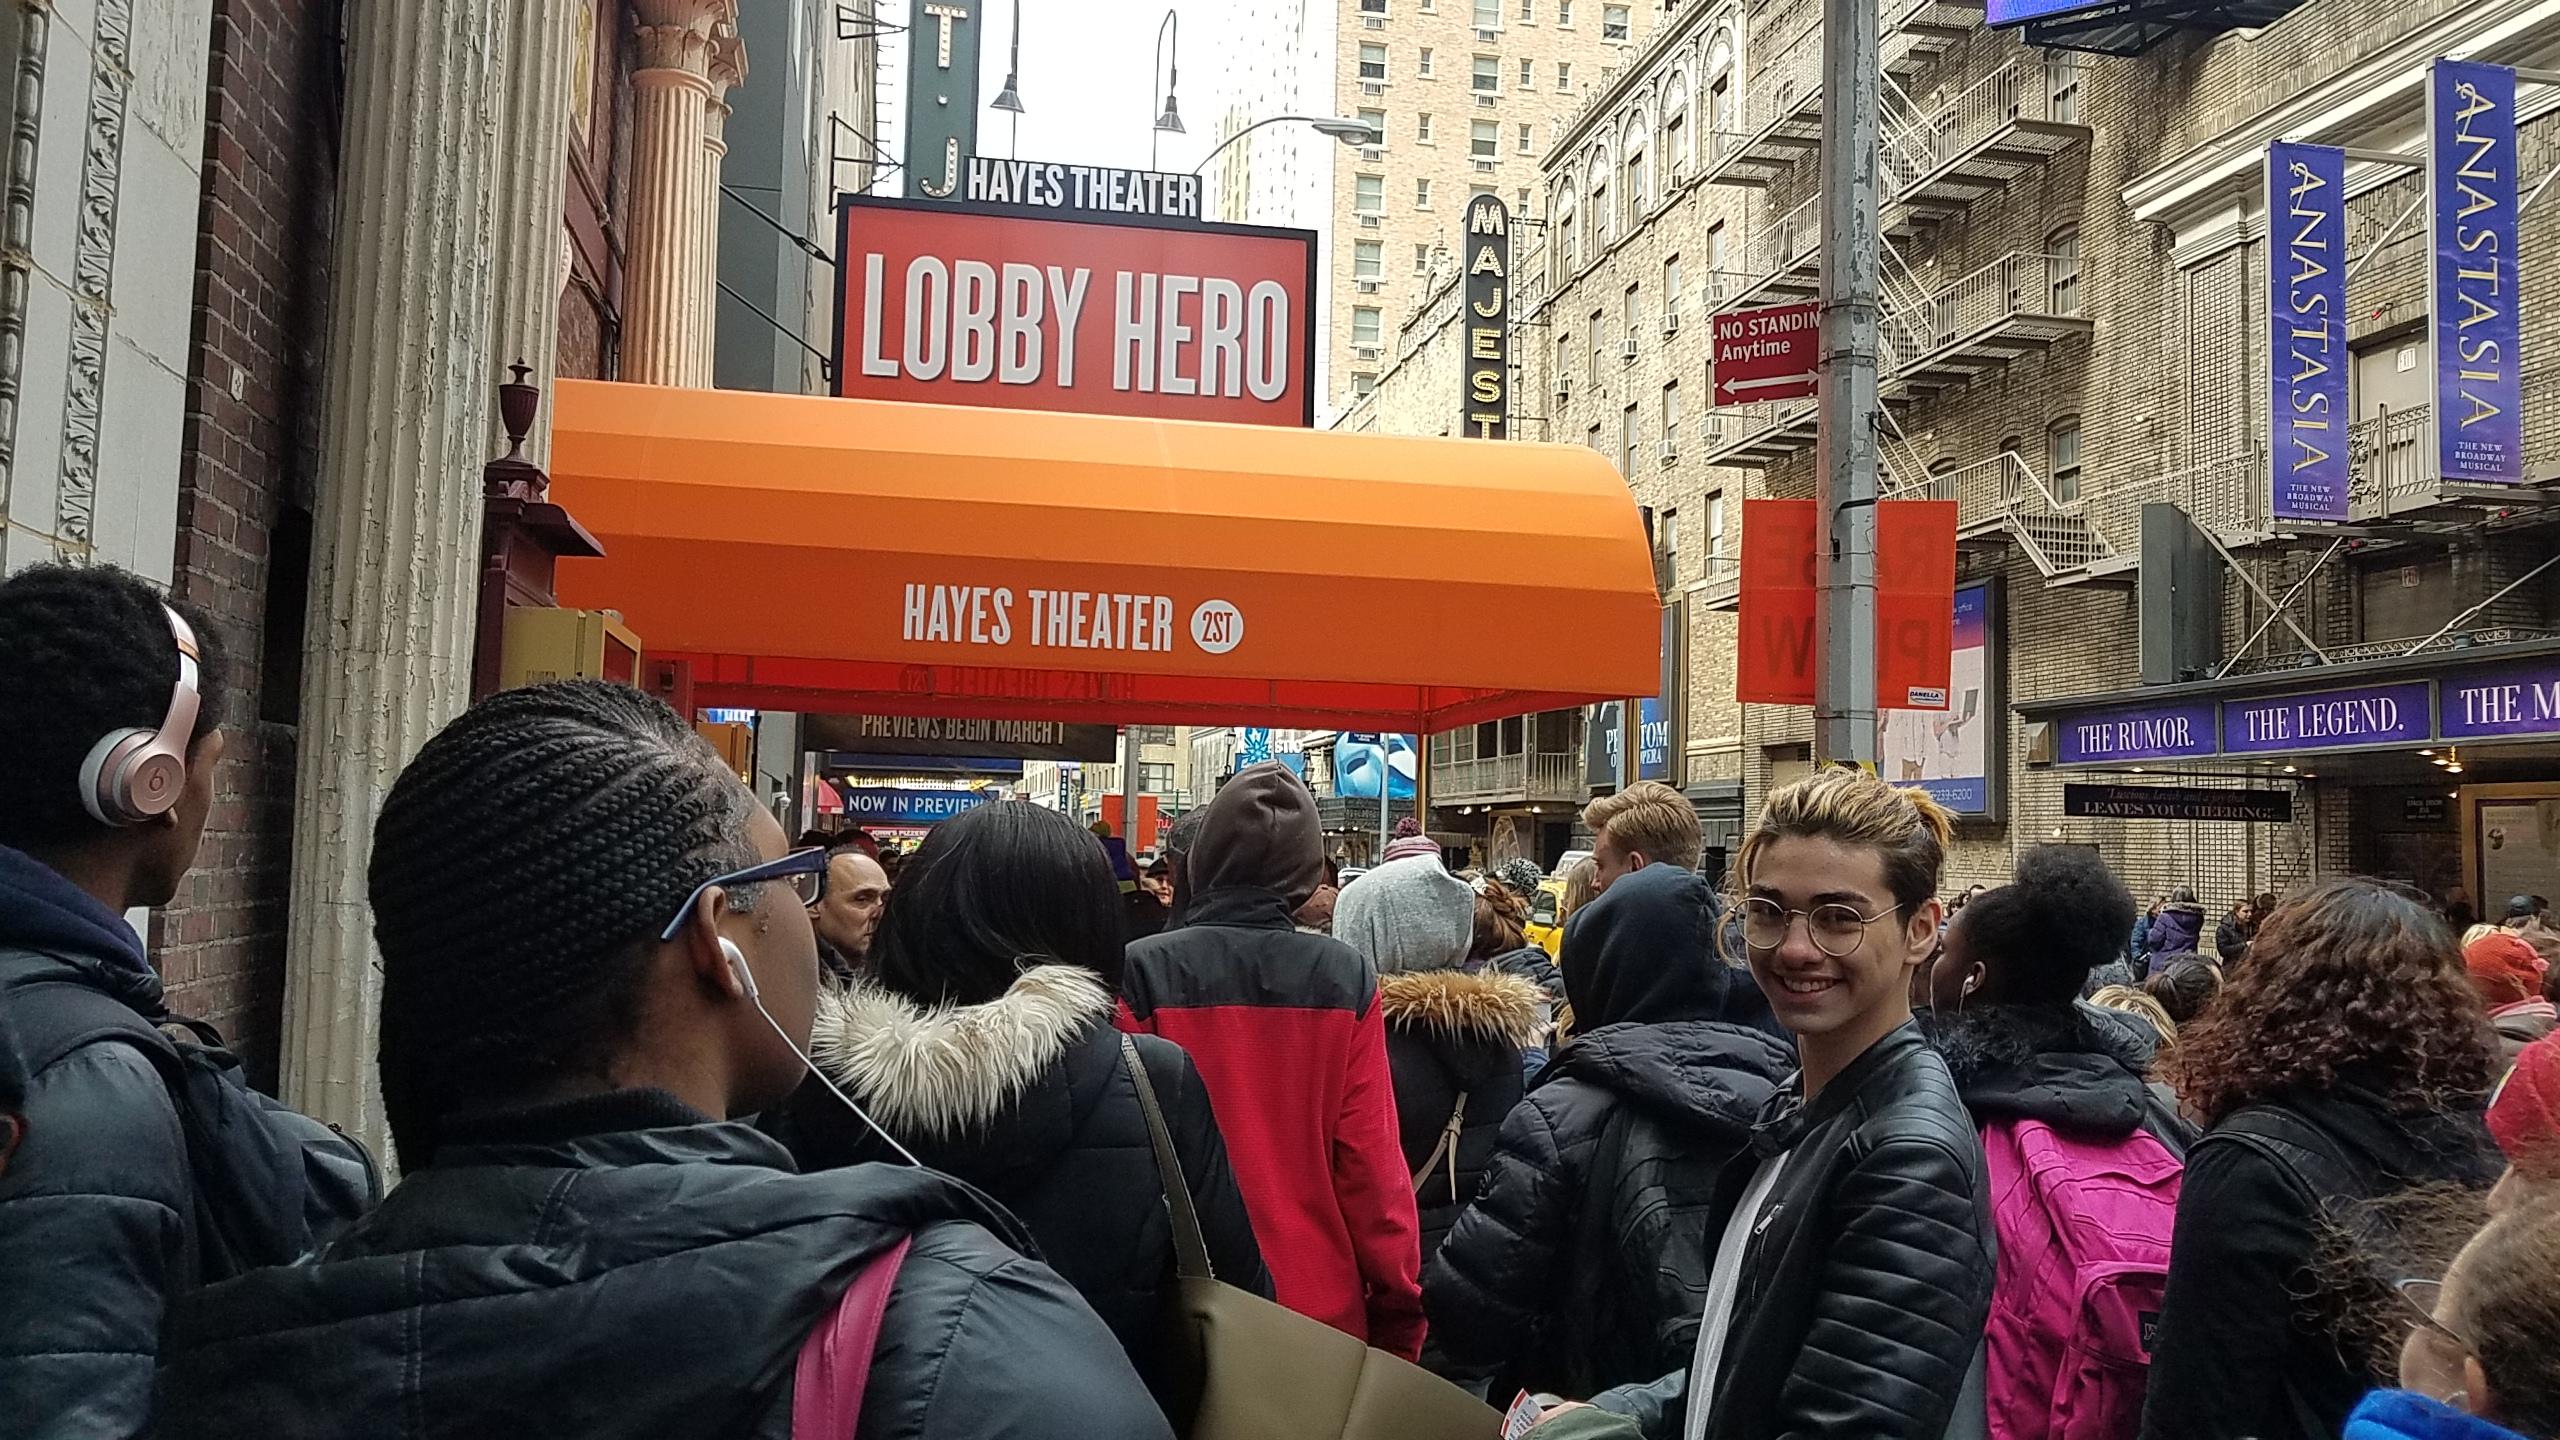 @ Lobby Hero